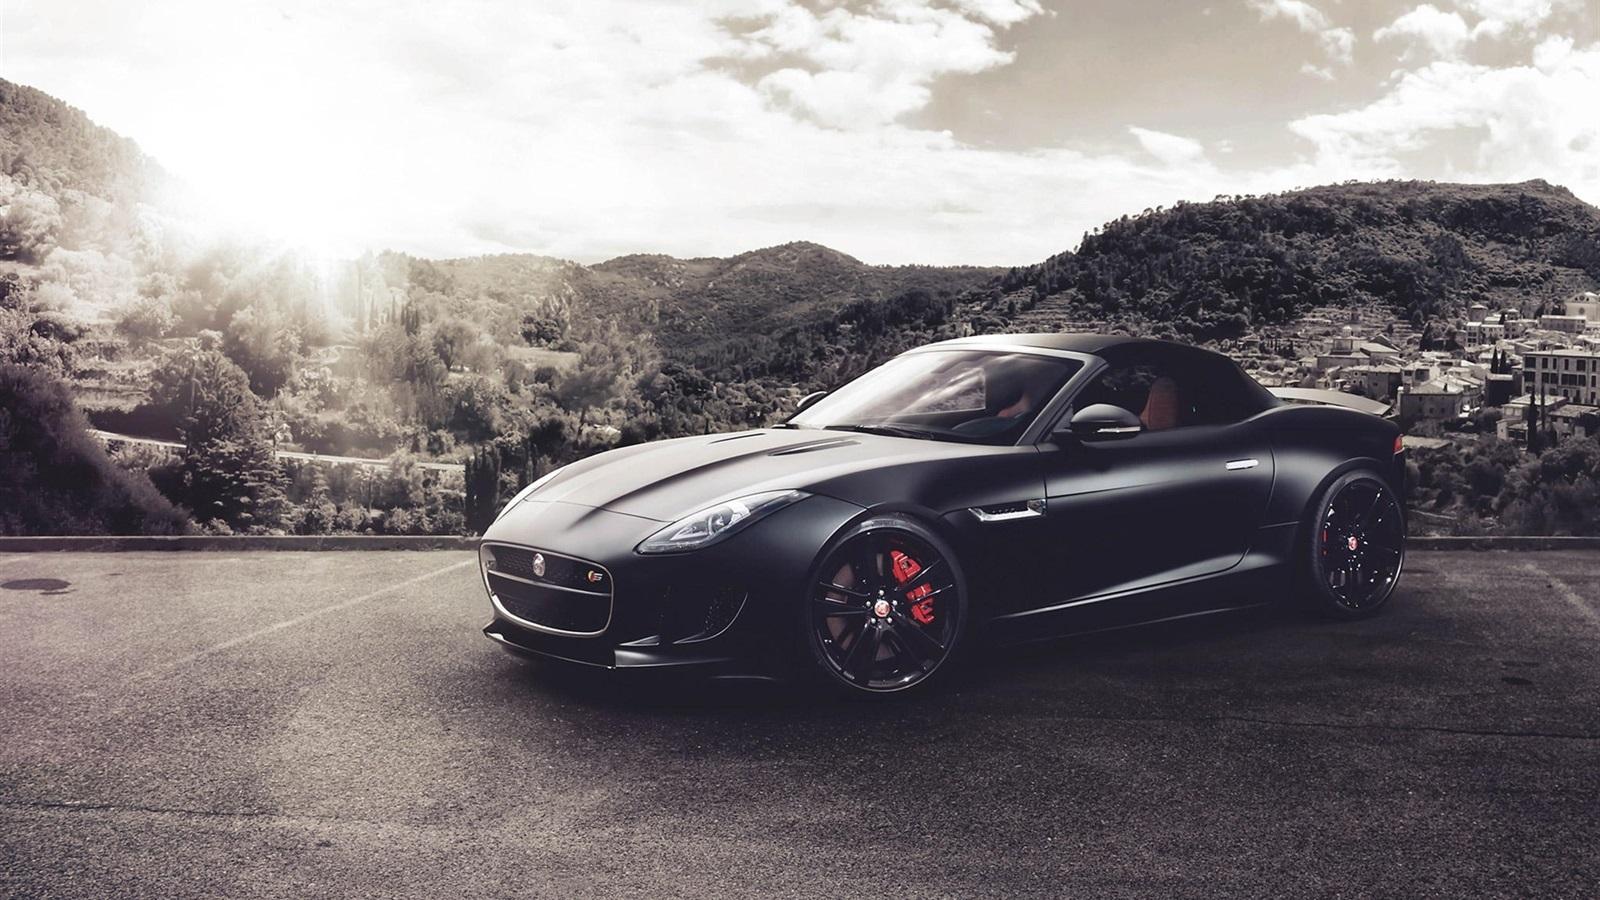 Black Jaguar Car Wallpaper